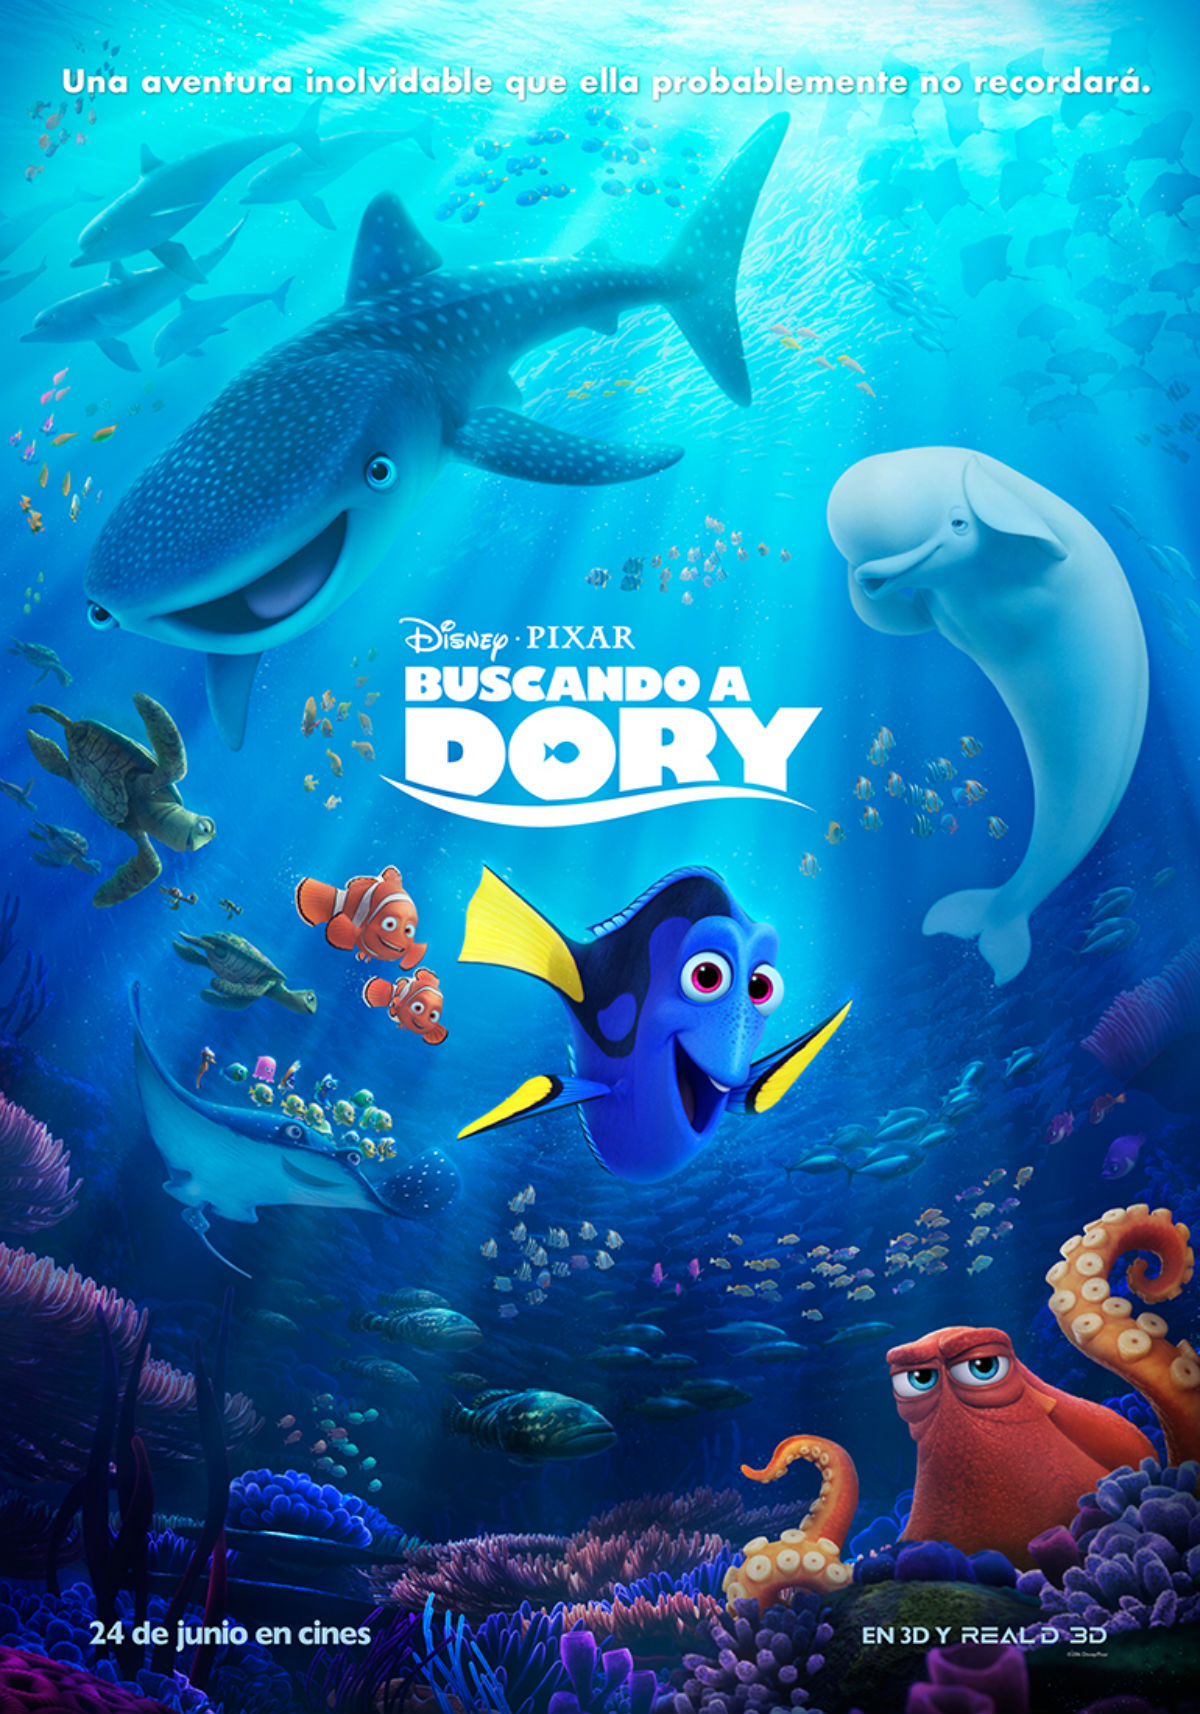 buscando-a-dory_poster